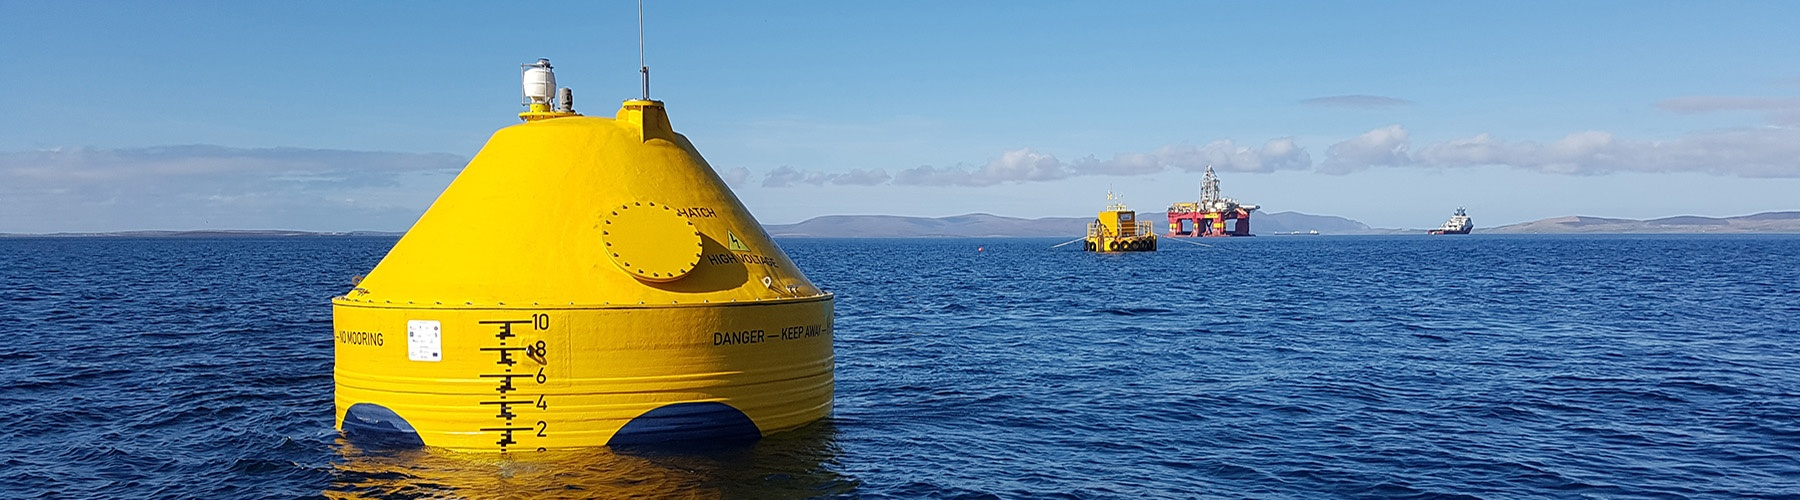 Wave energy converter prototype deployed at sea